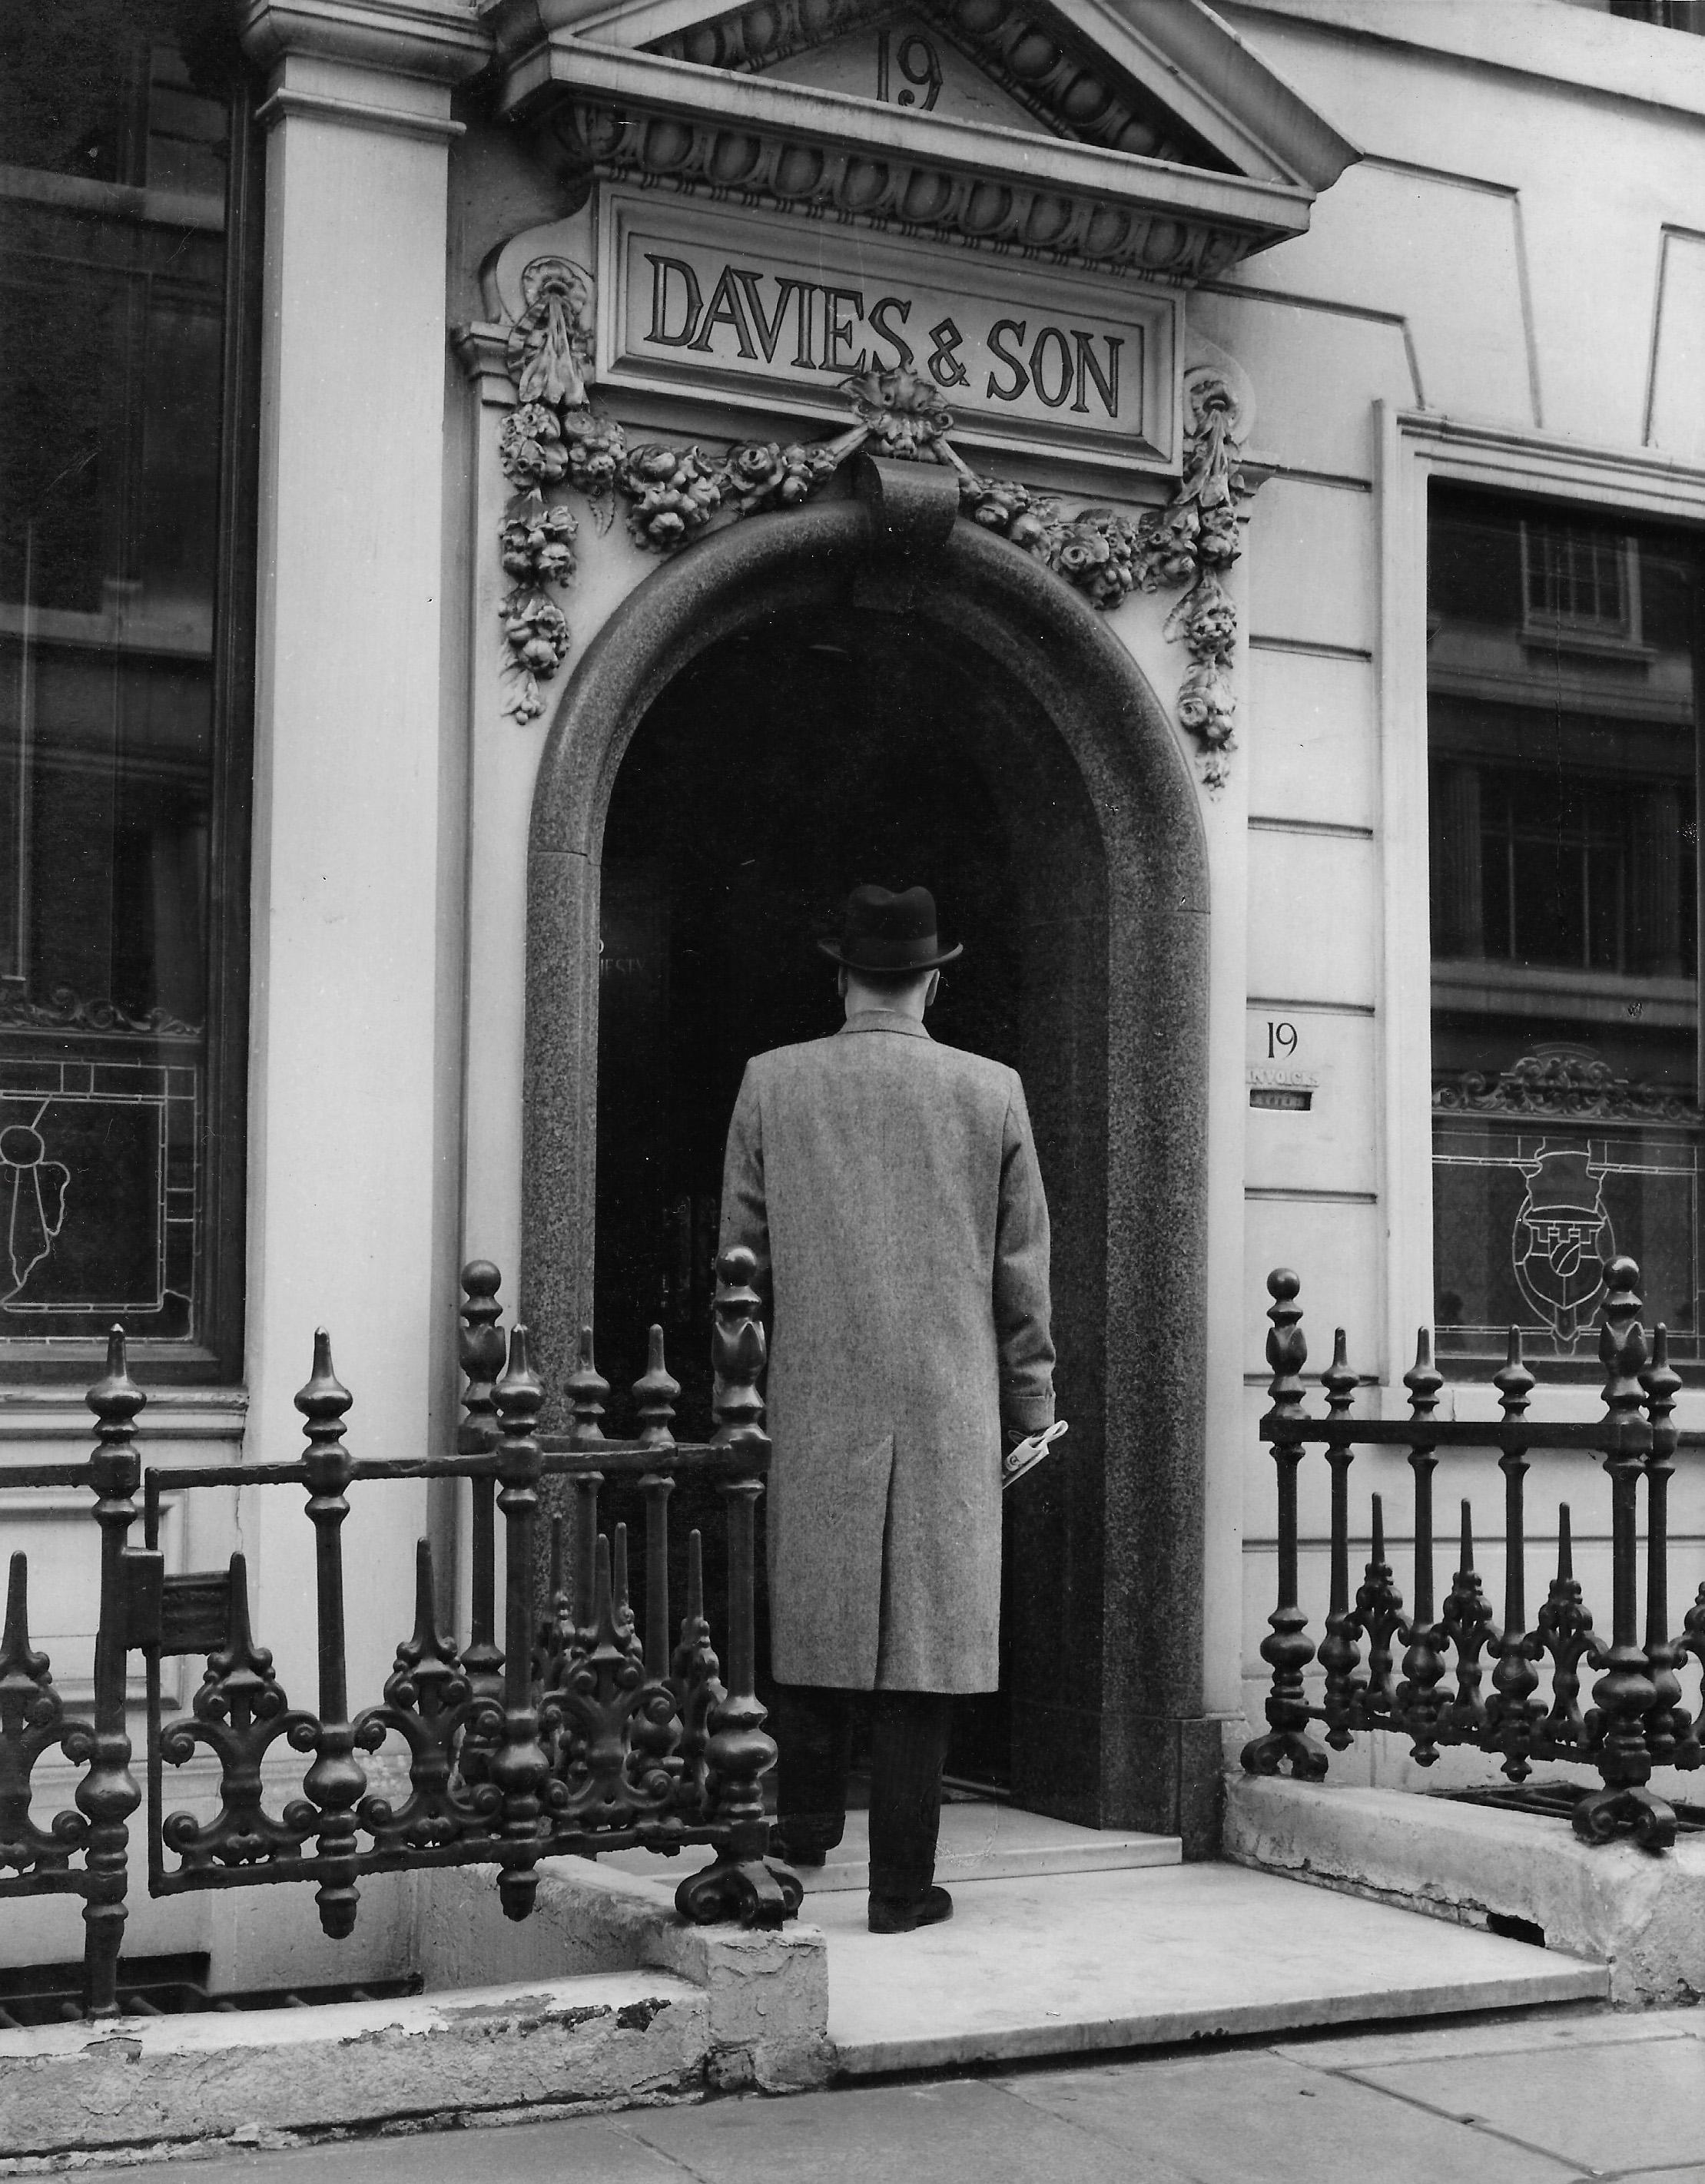 Davies and Son Savile Row Tailor entrance